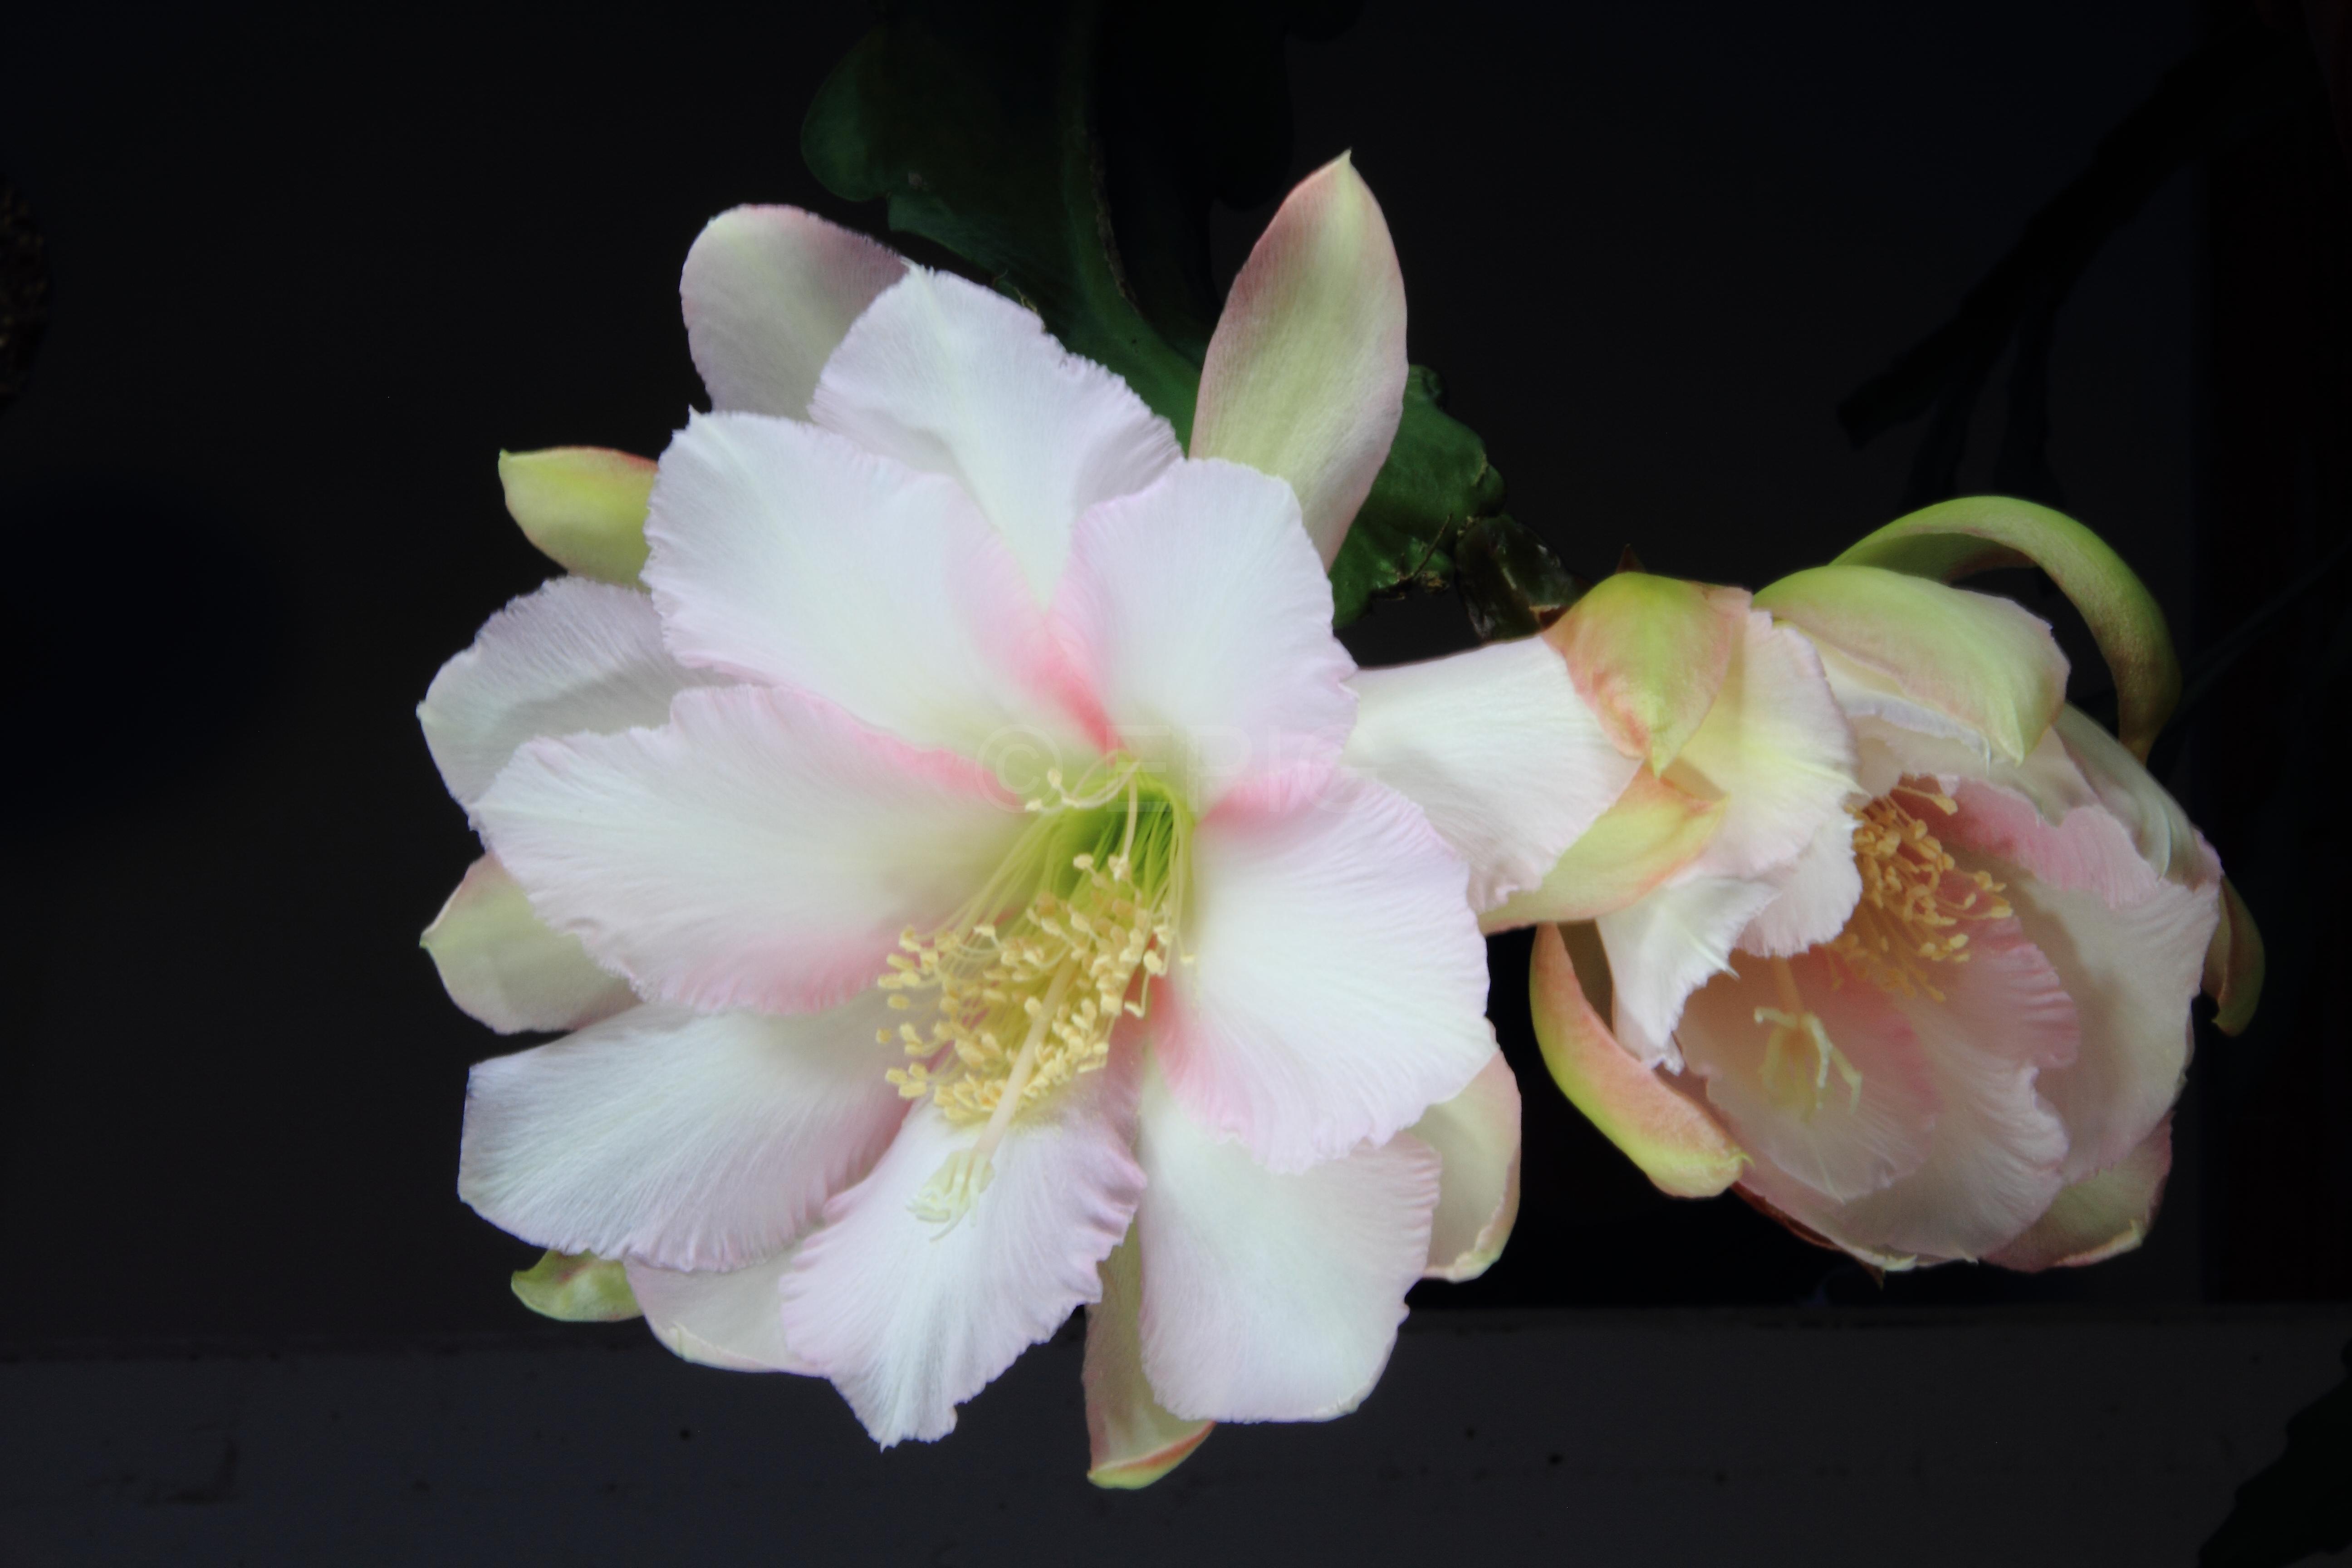 Epikaktus 'Lily Dache' (Foto Heiner Düsterhaus)